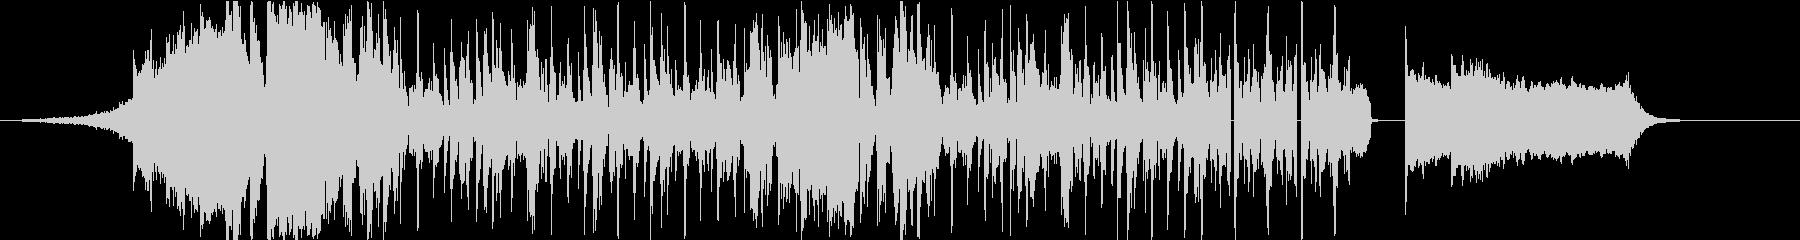 HipHop8小節(DJプレイ風)の未再生の波形